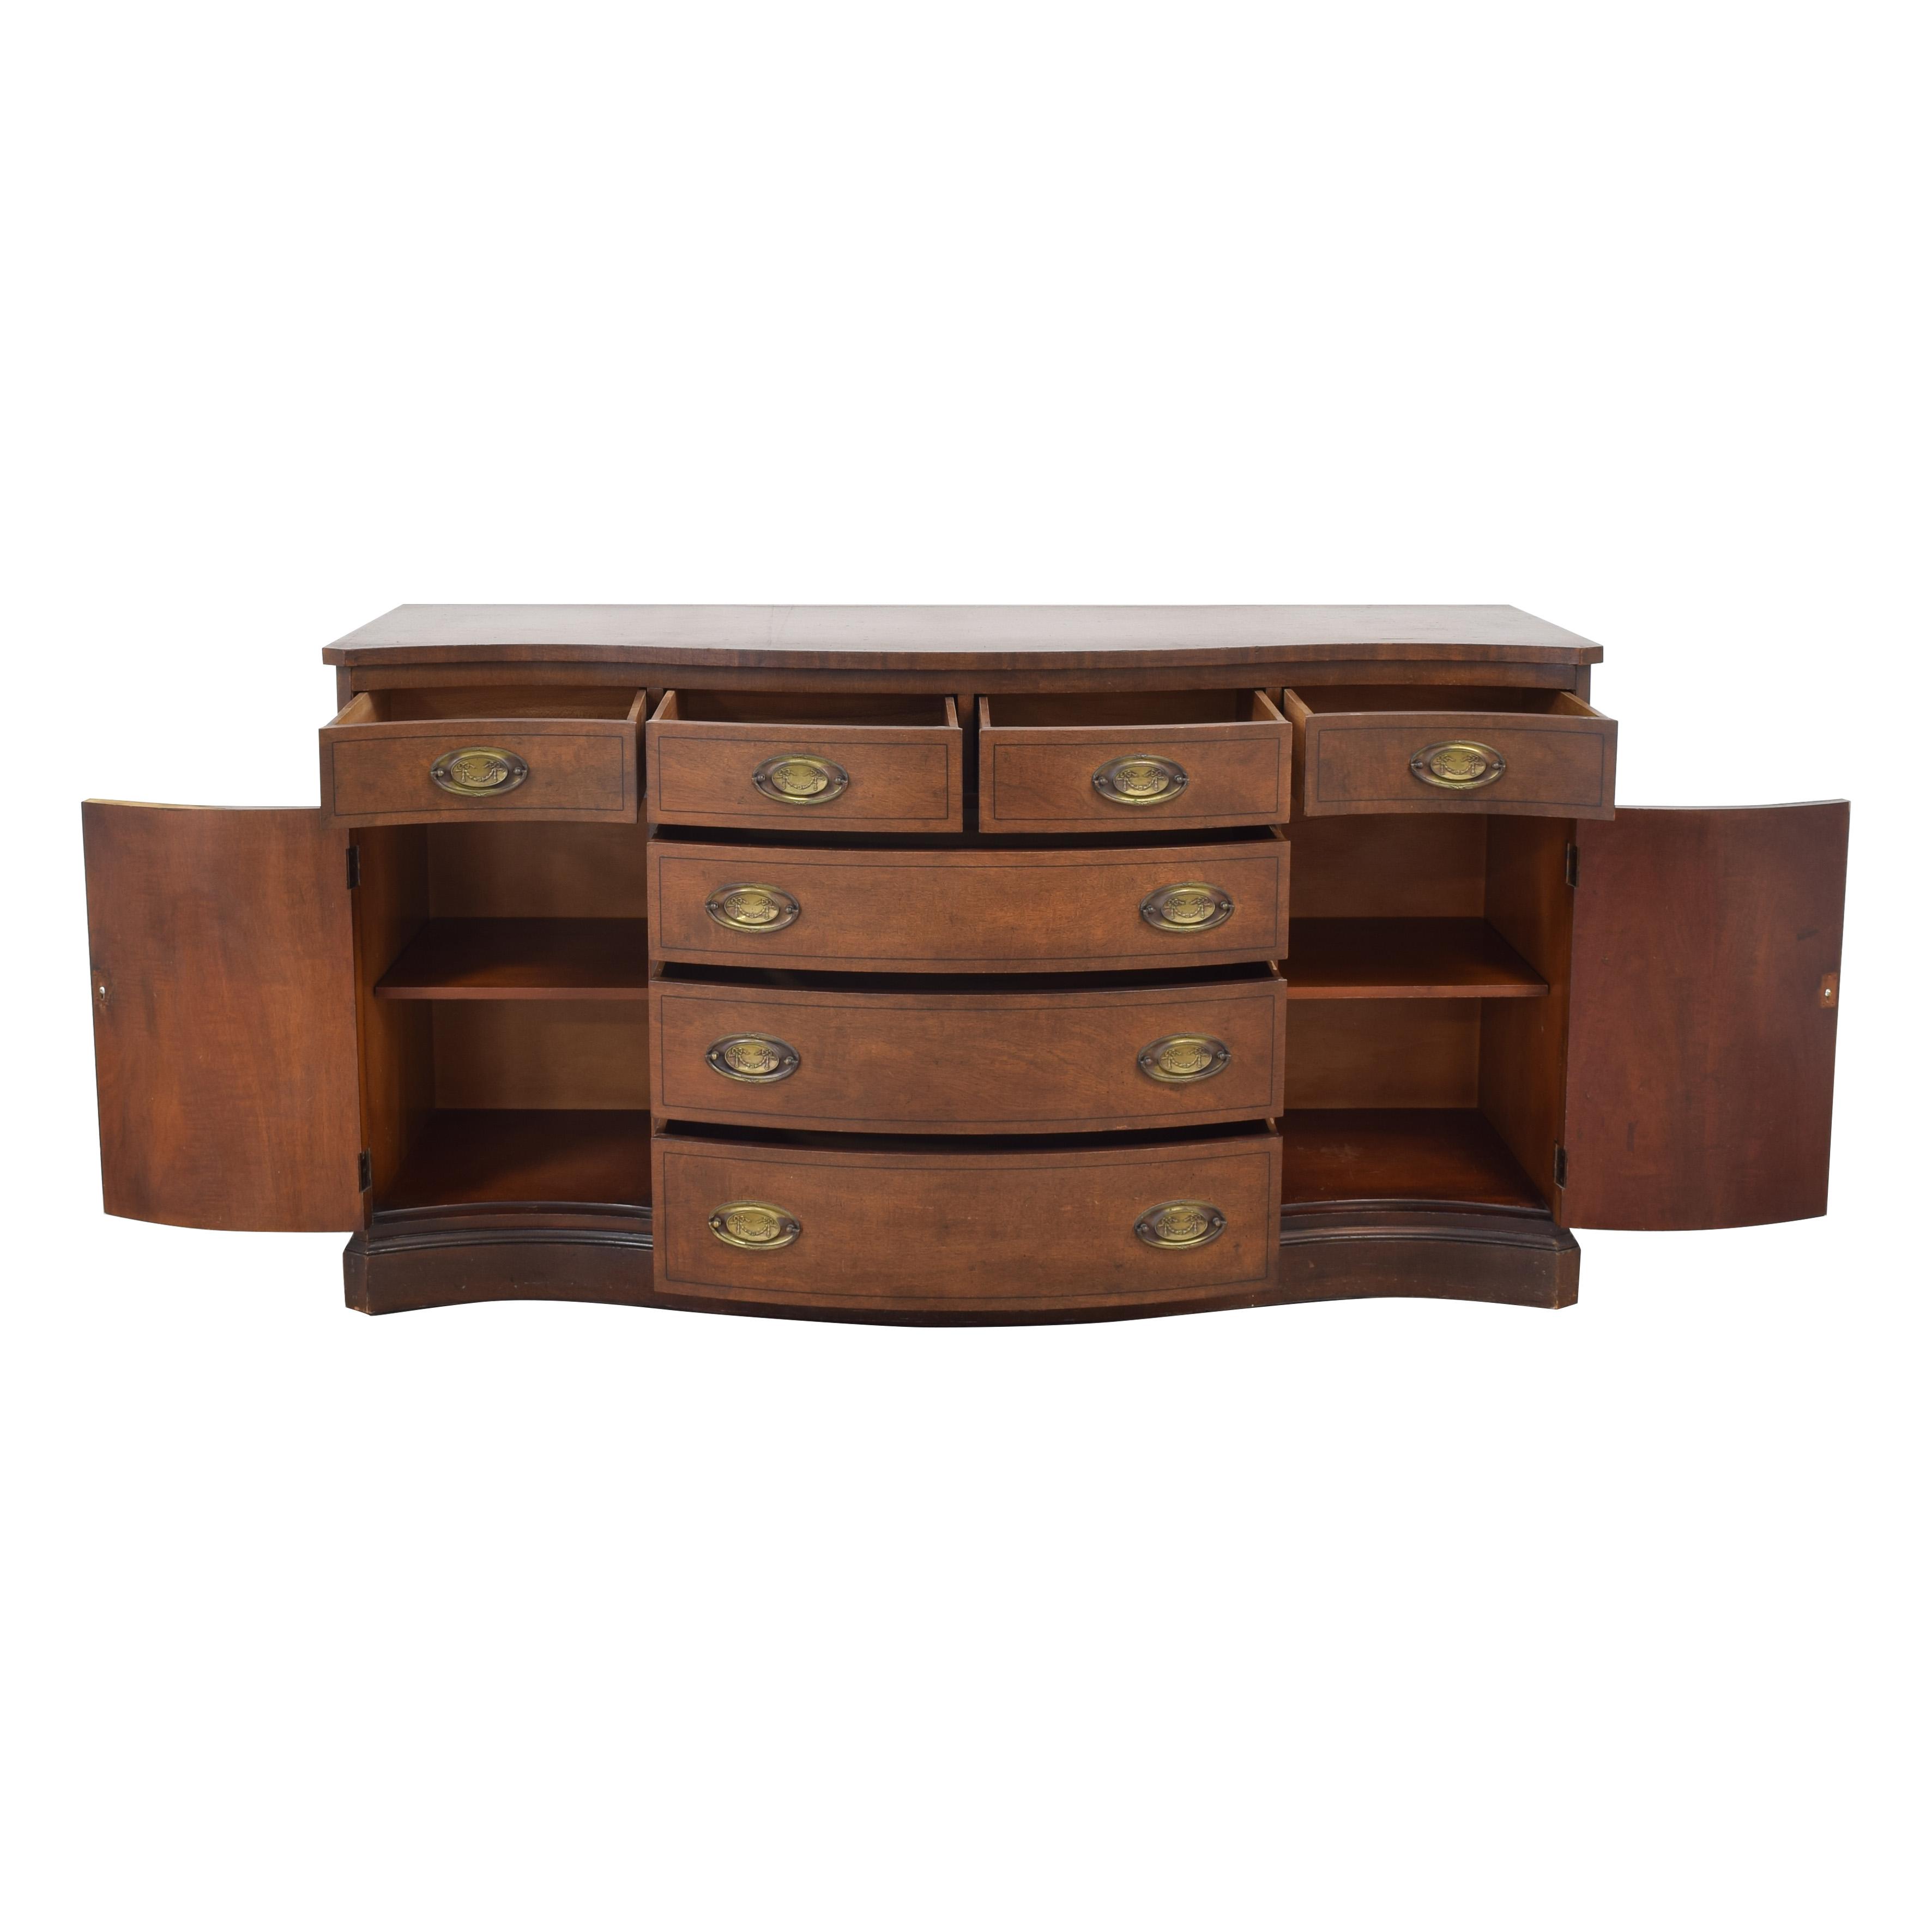 Henredon Furniture Vintage Henredon Heritage Buffet nj